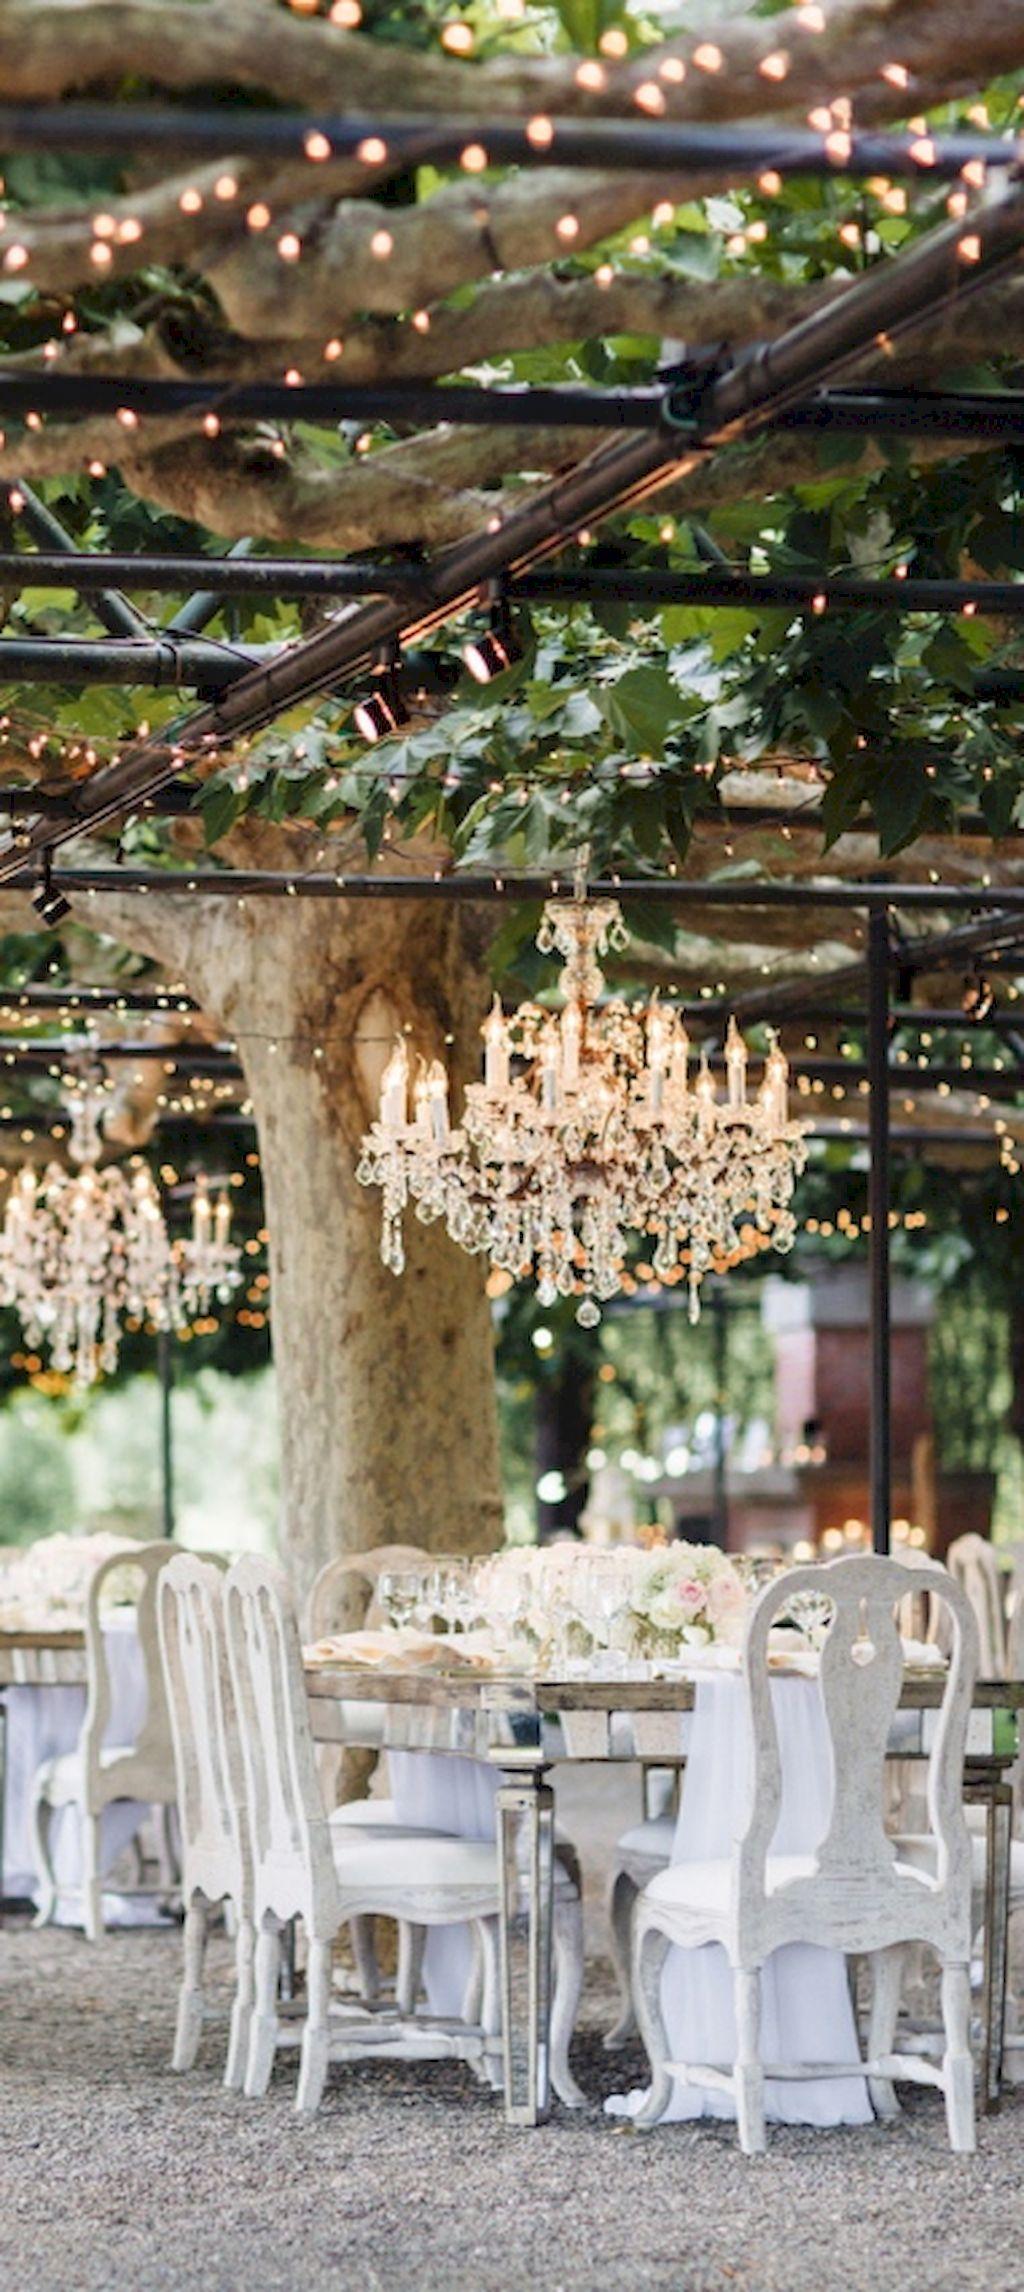 81 Elegant Outdoor Vineyard Wedding Decorations Ideas